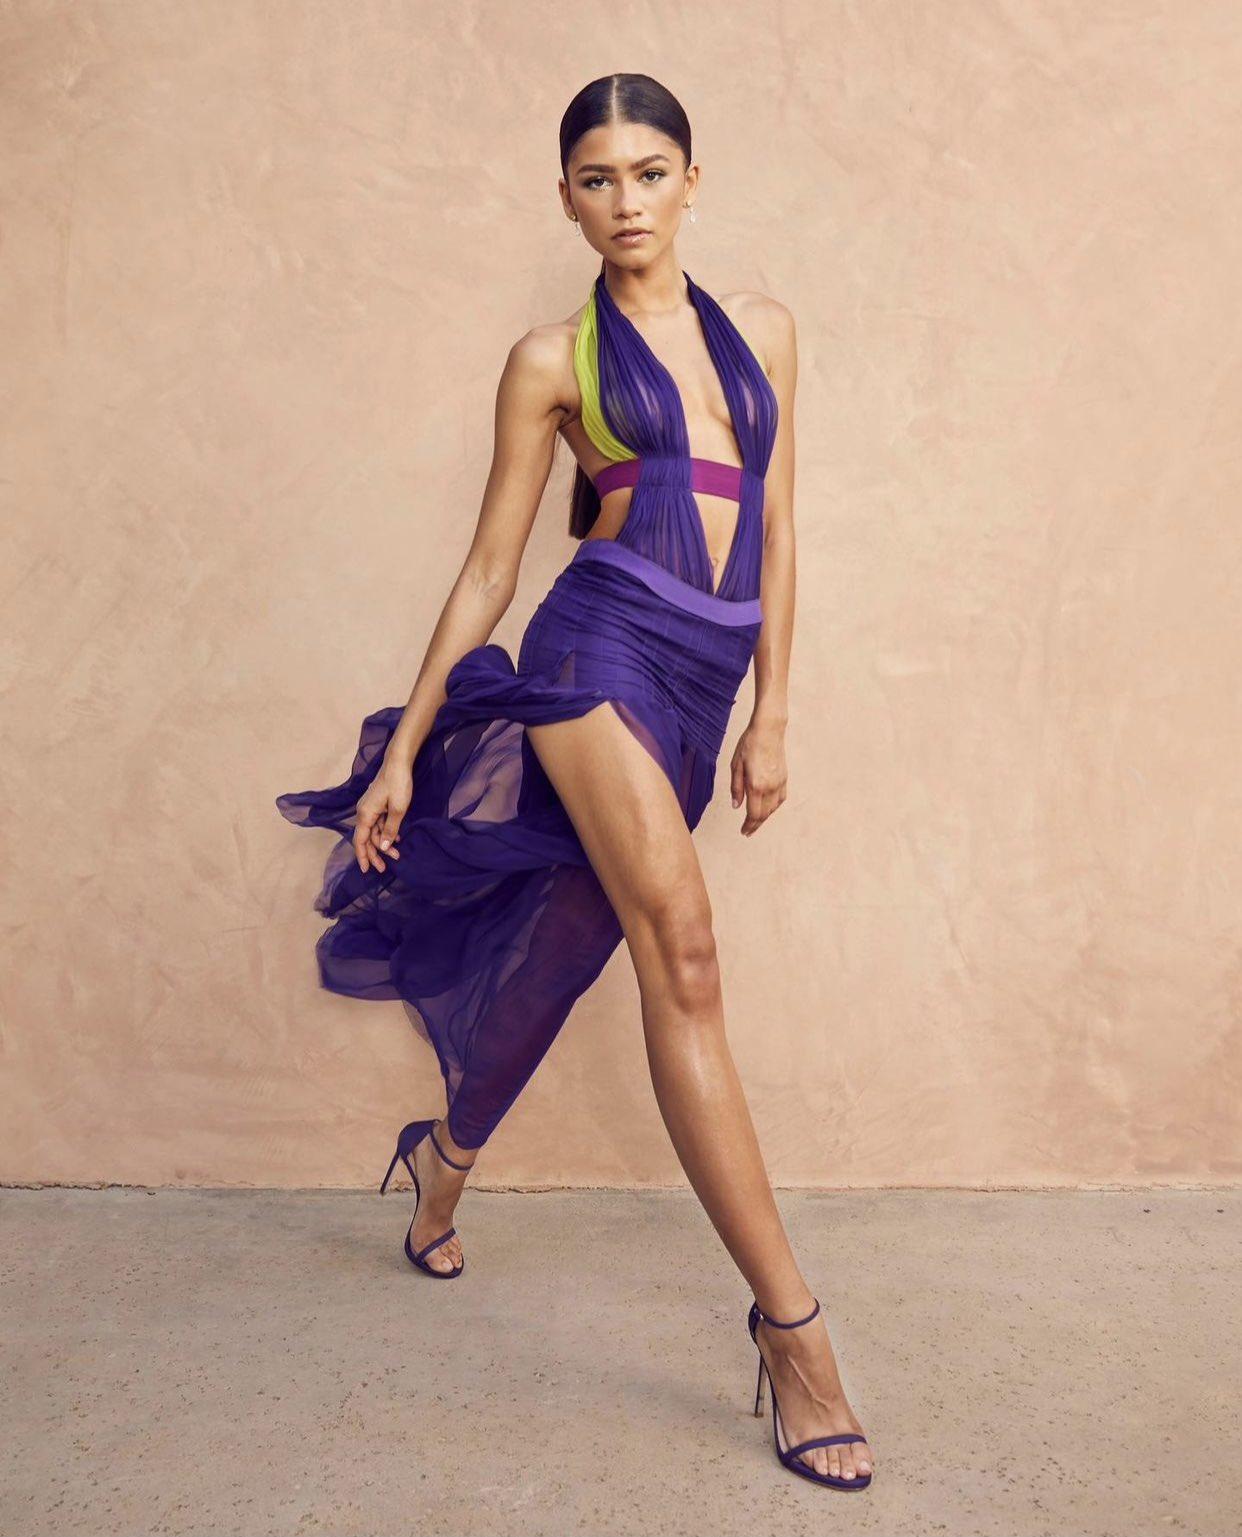 Zendaya is fierce in Versace at the 2021 BET Awards